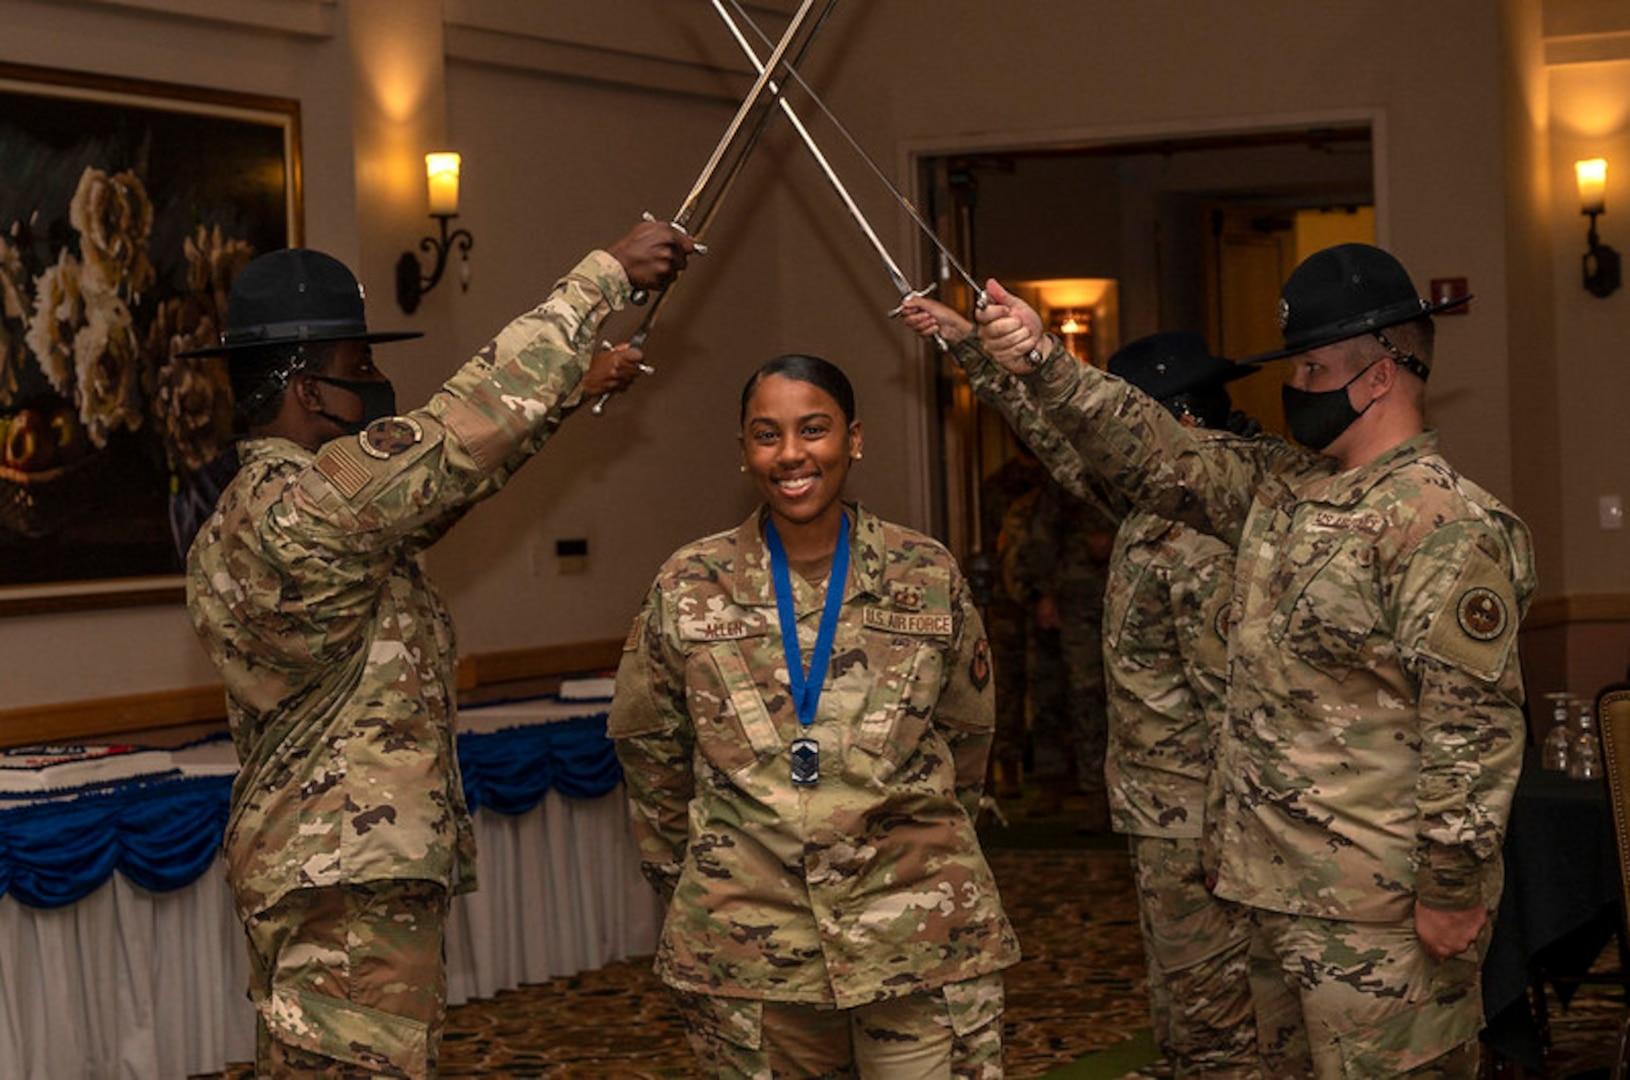 Female NCO passes under saber cordon